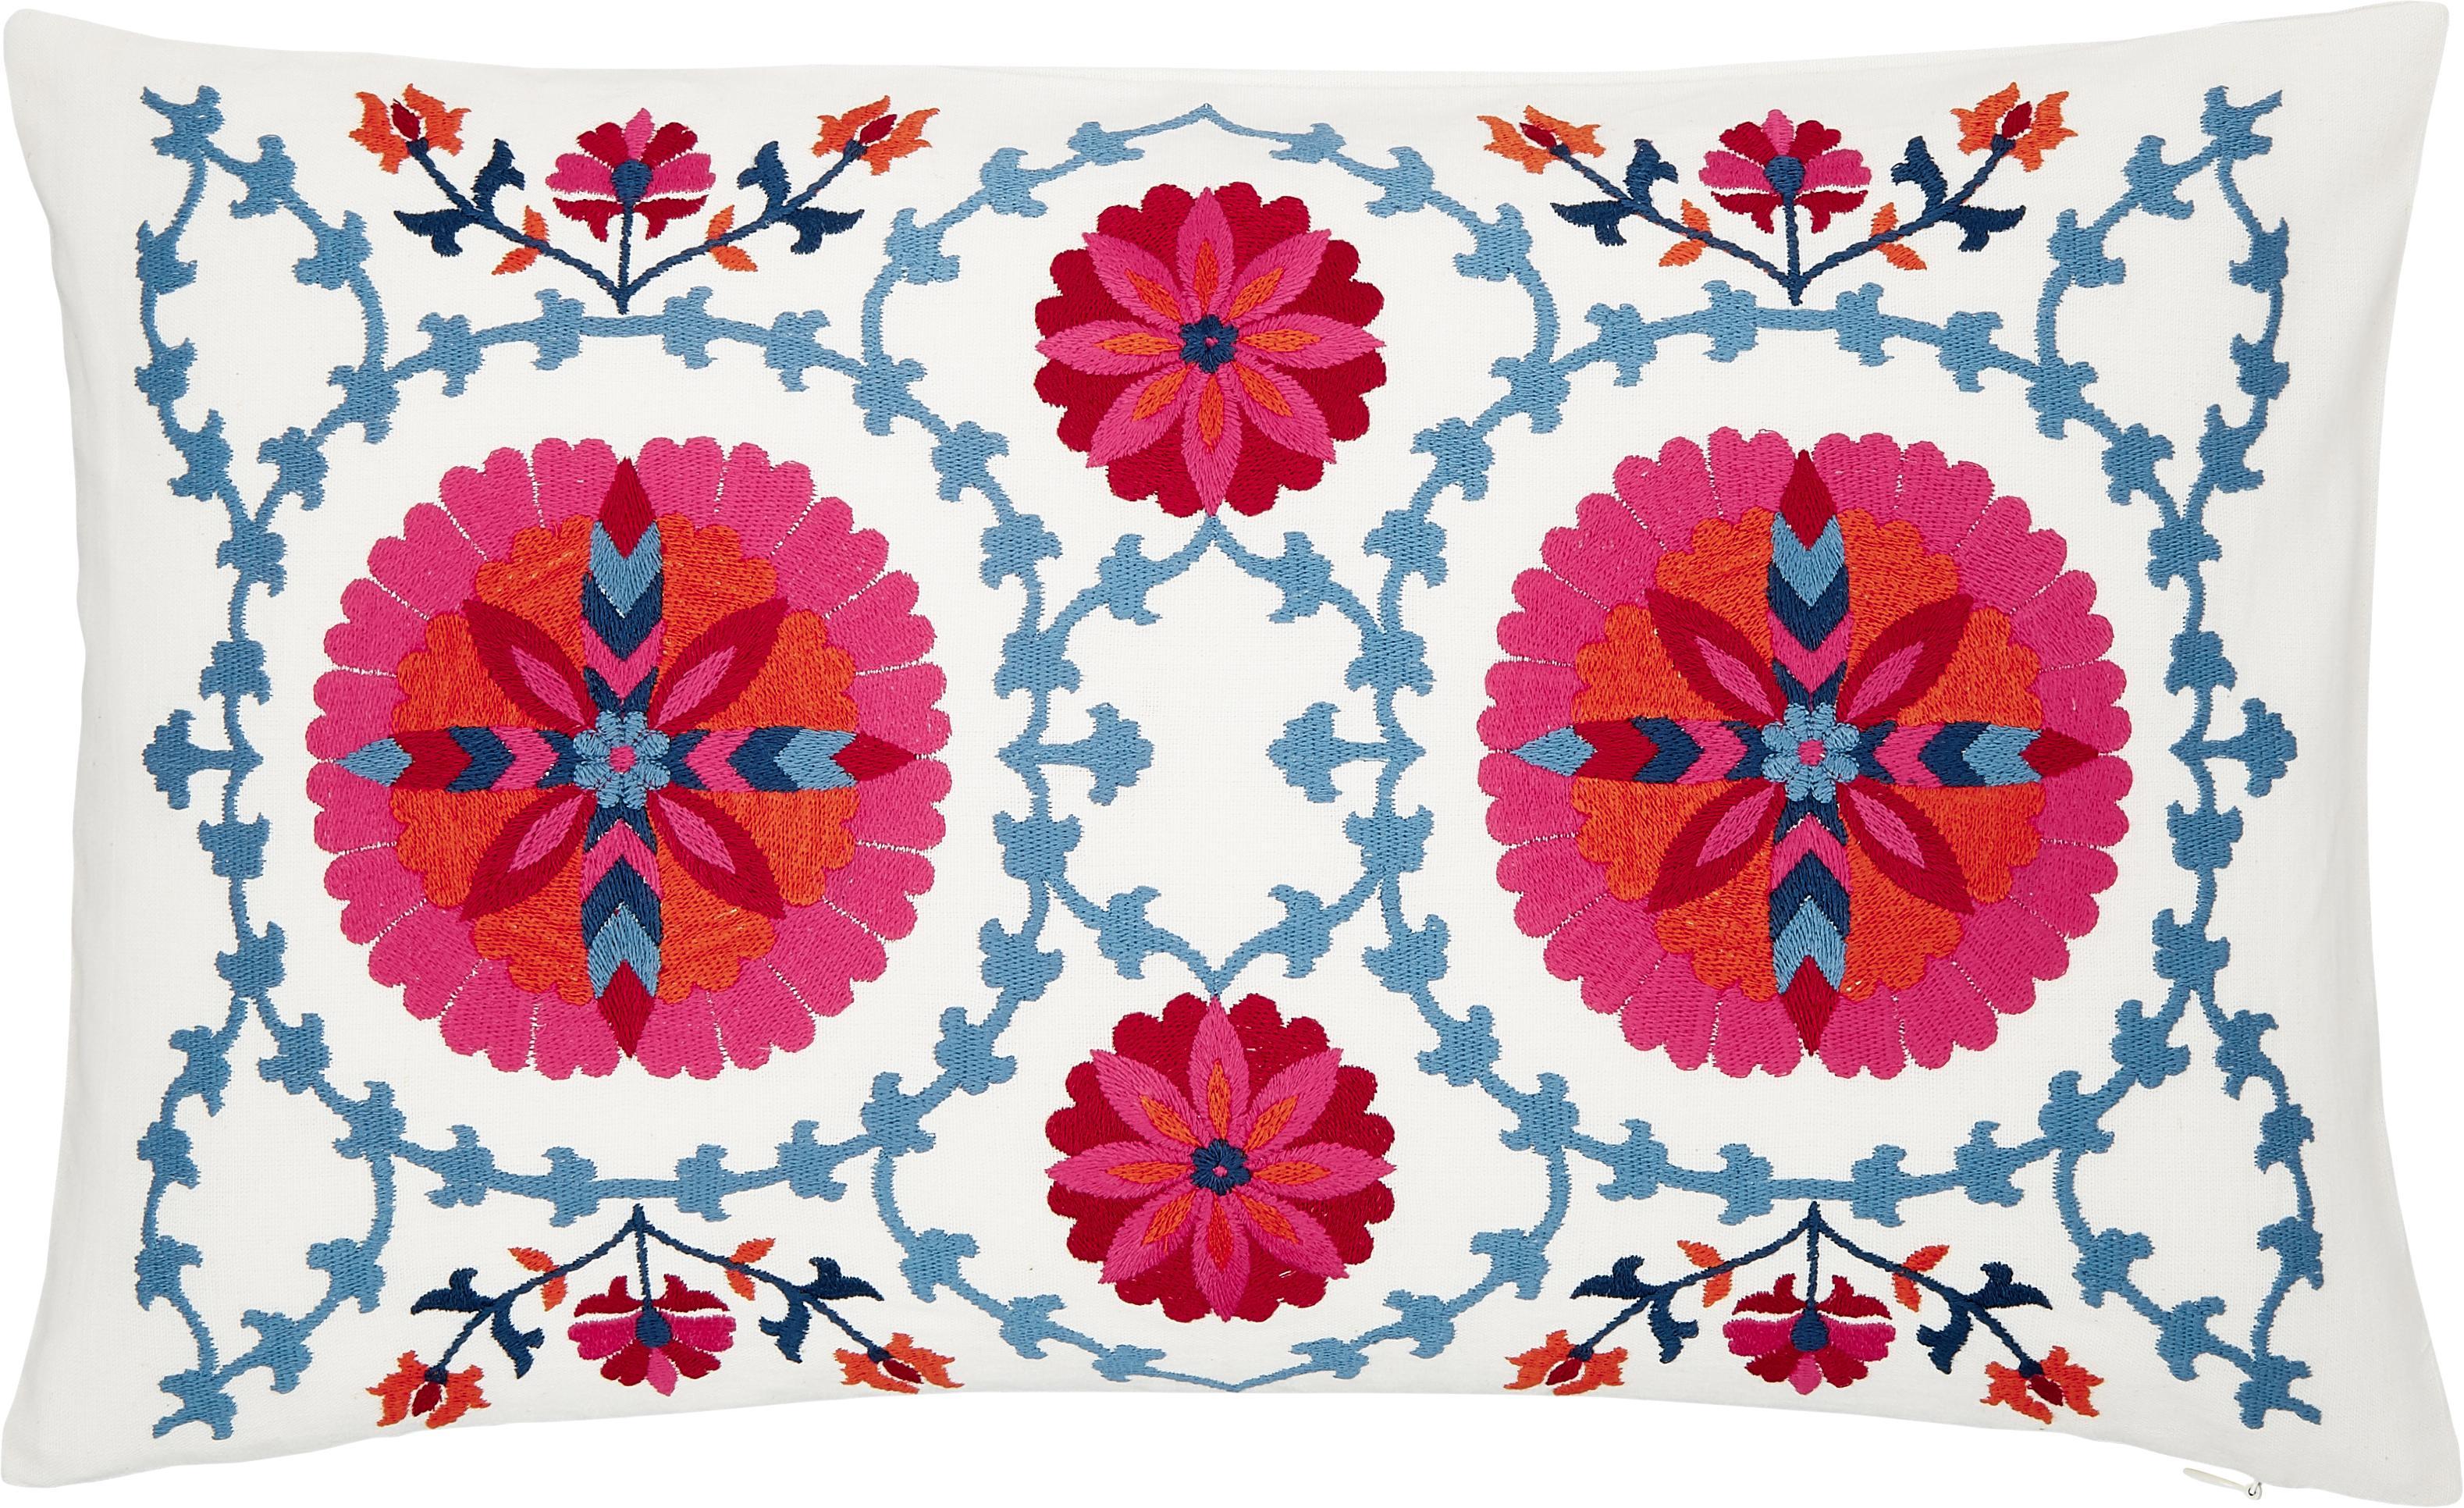 Geborduurde  kussenhoes Tabula, 100% katoen, Crèmewit, multicolour, 30 x 50 cm